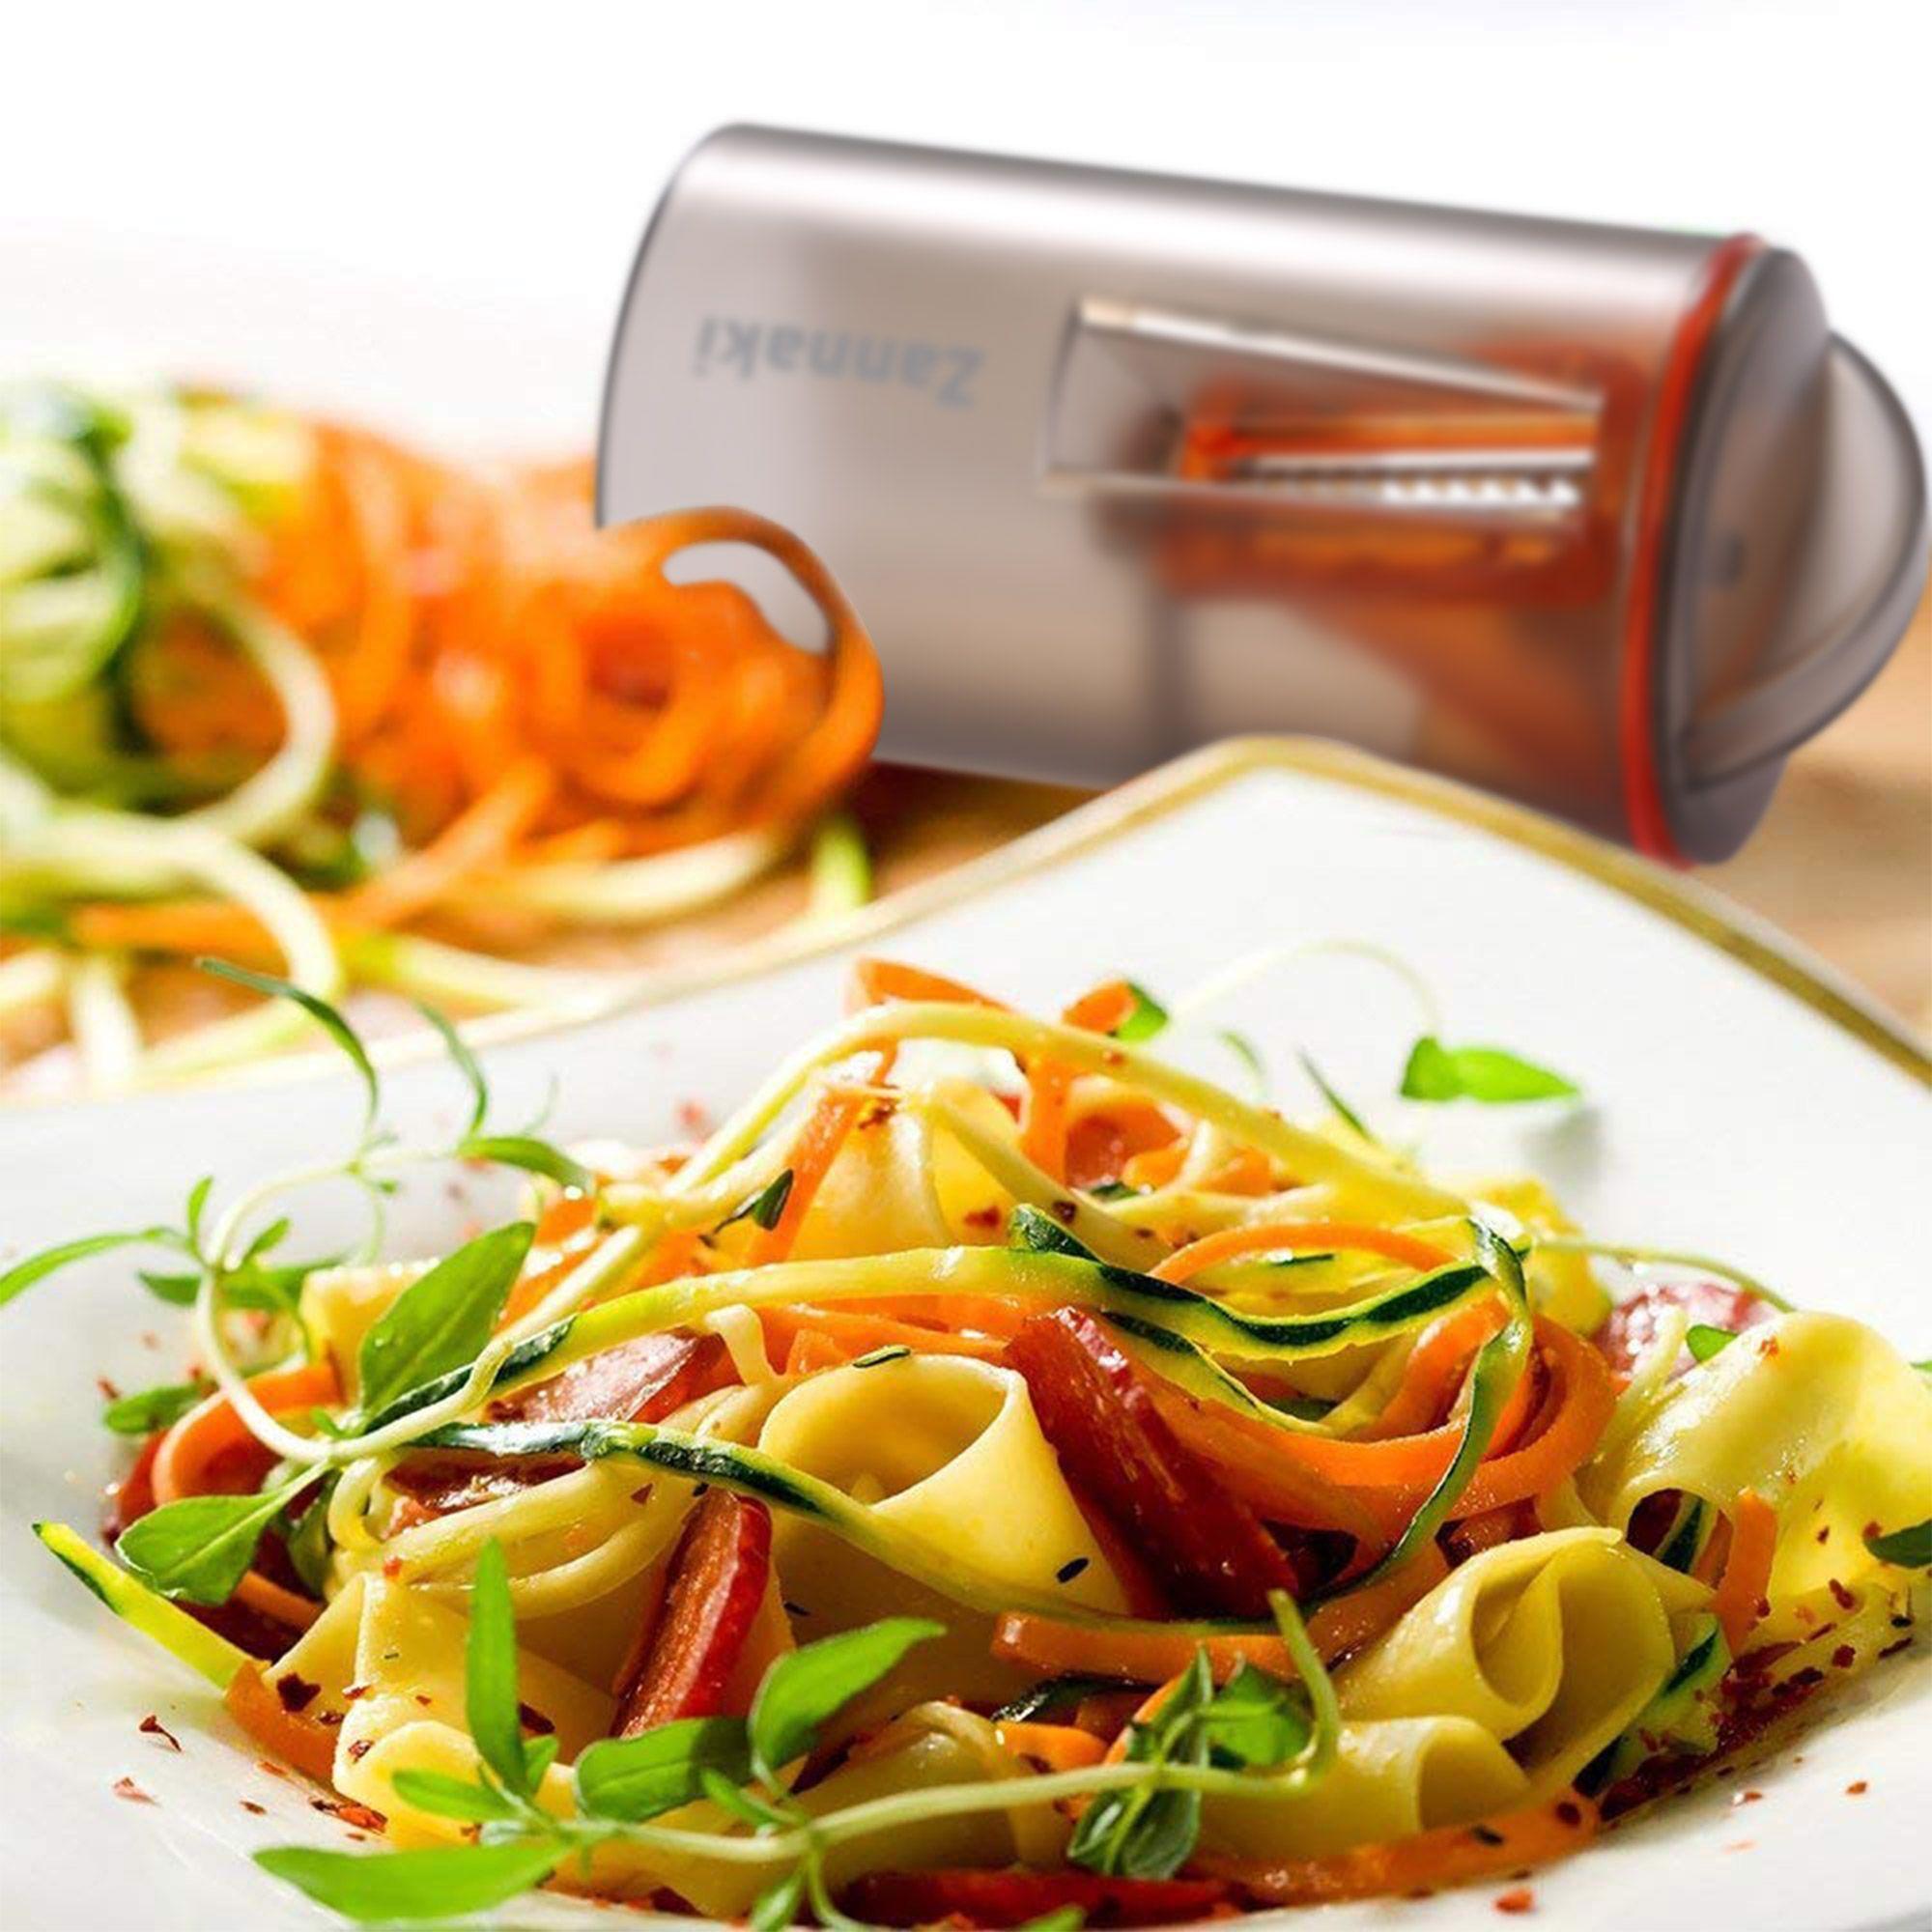 Zannaki Spiralizer Pasta Noodle Maker Spiral Zucchini